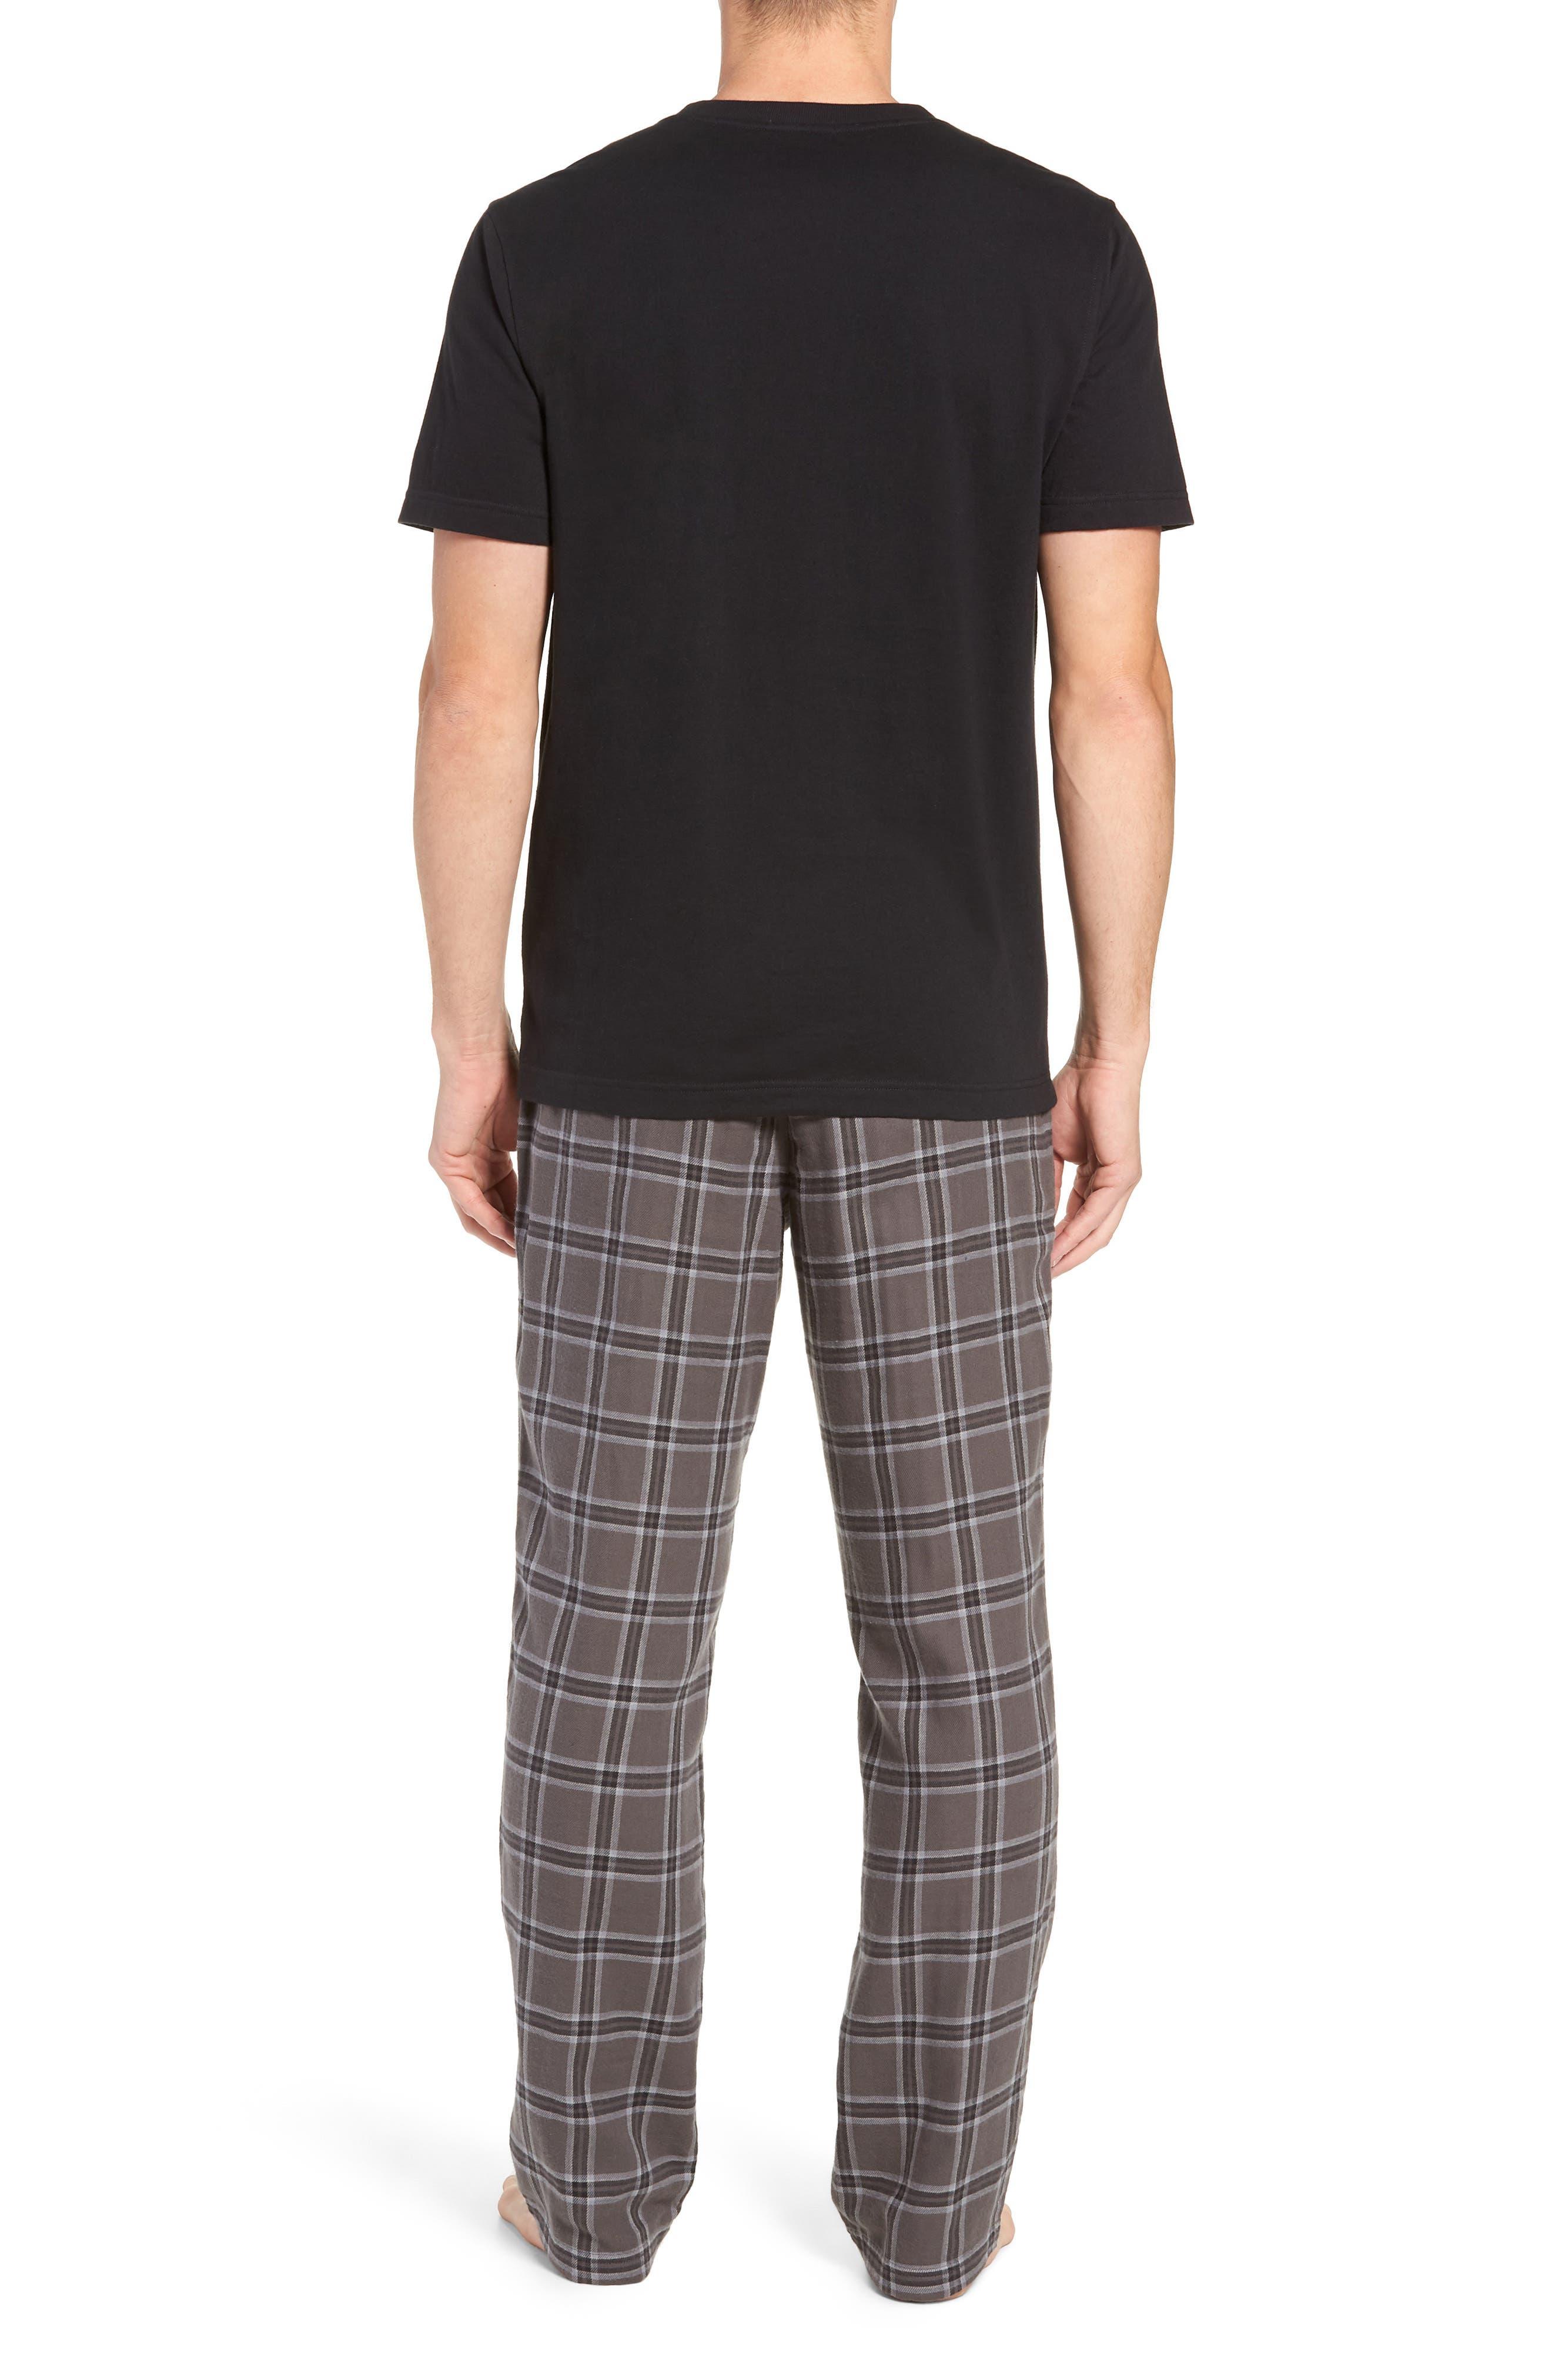 Grant Pajama Set,                             Alternate thumbnail 2, color,                             CHARCOAL/ BLACK